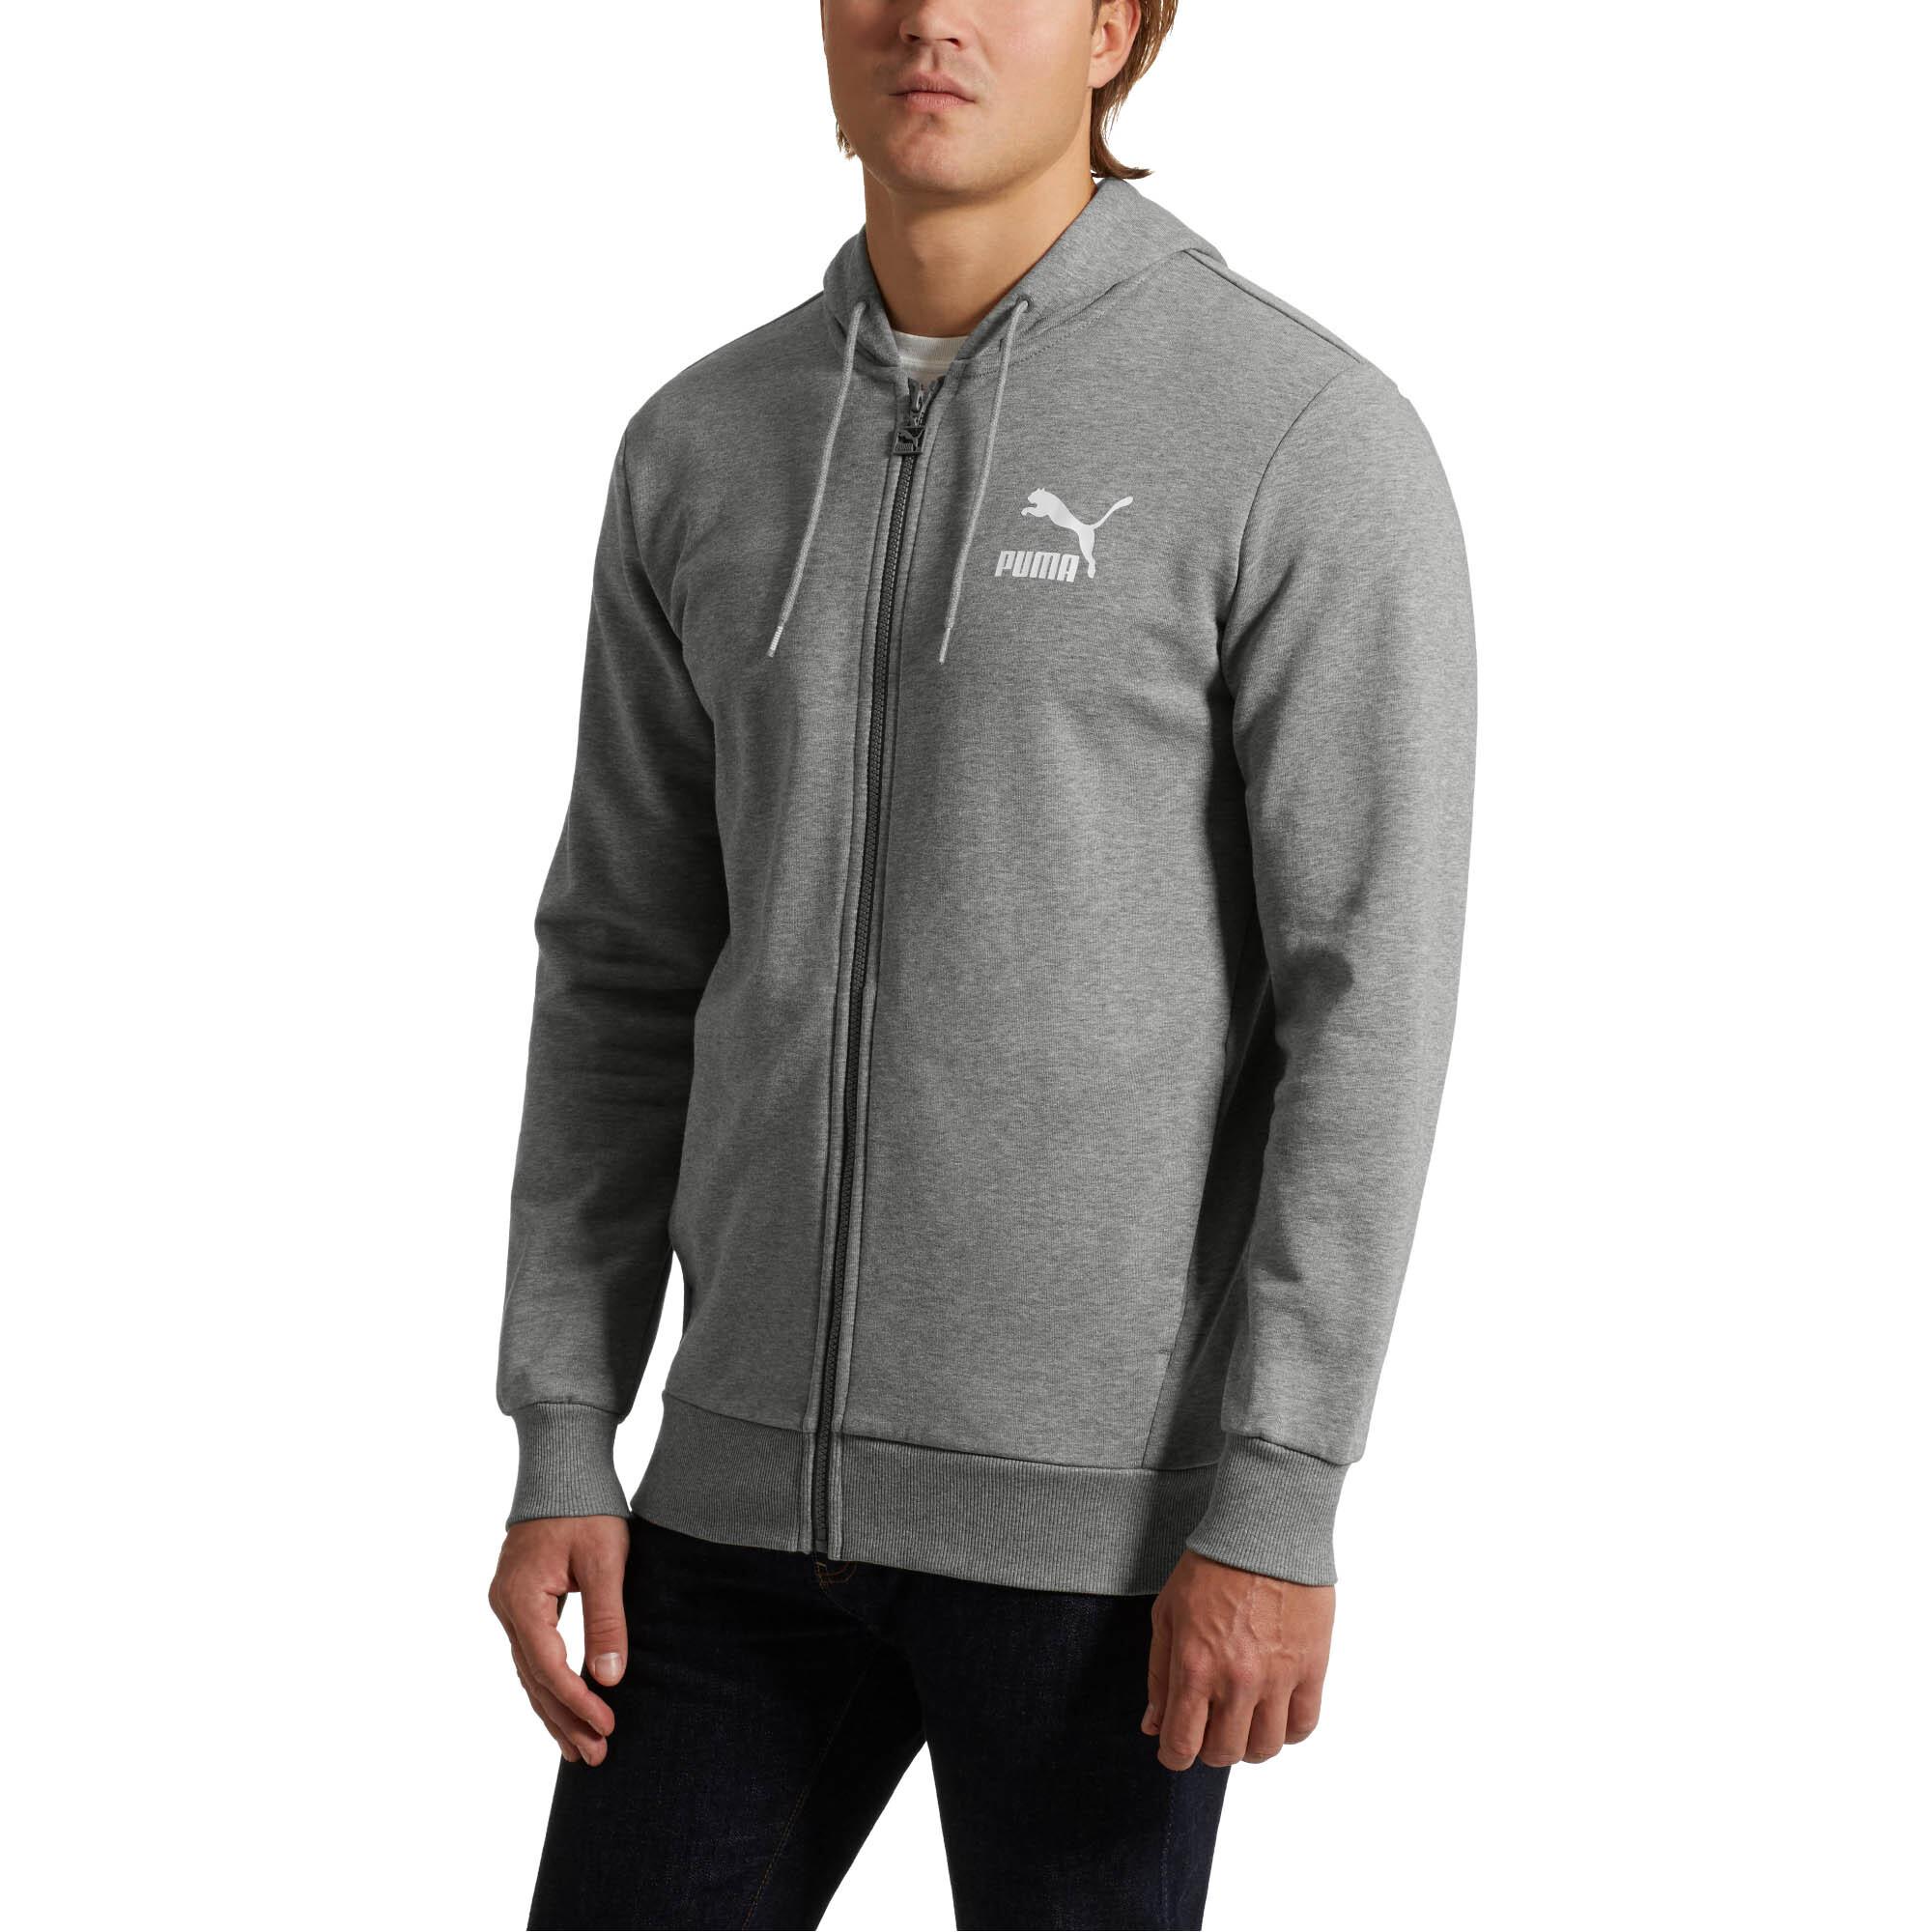 PUMA-Classics-Men-s-Full-Zip-Logo-Hoodie-Men-Sweat-Sport-Classics thumbnail 3